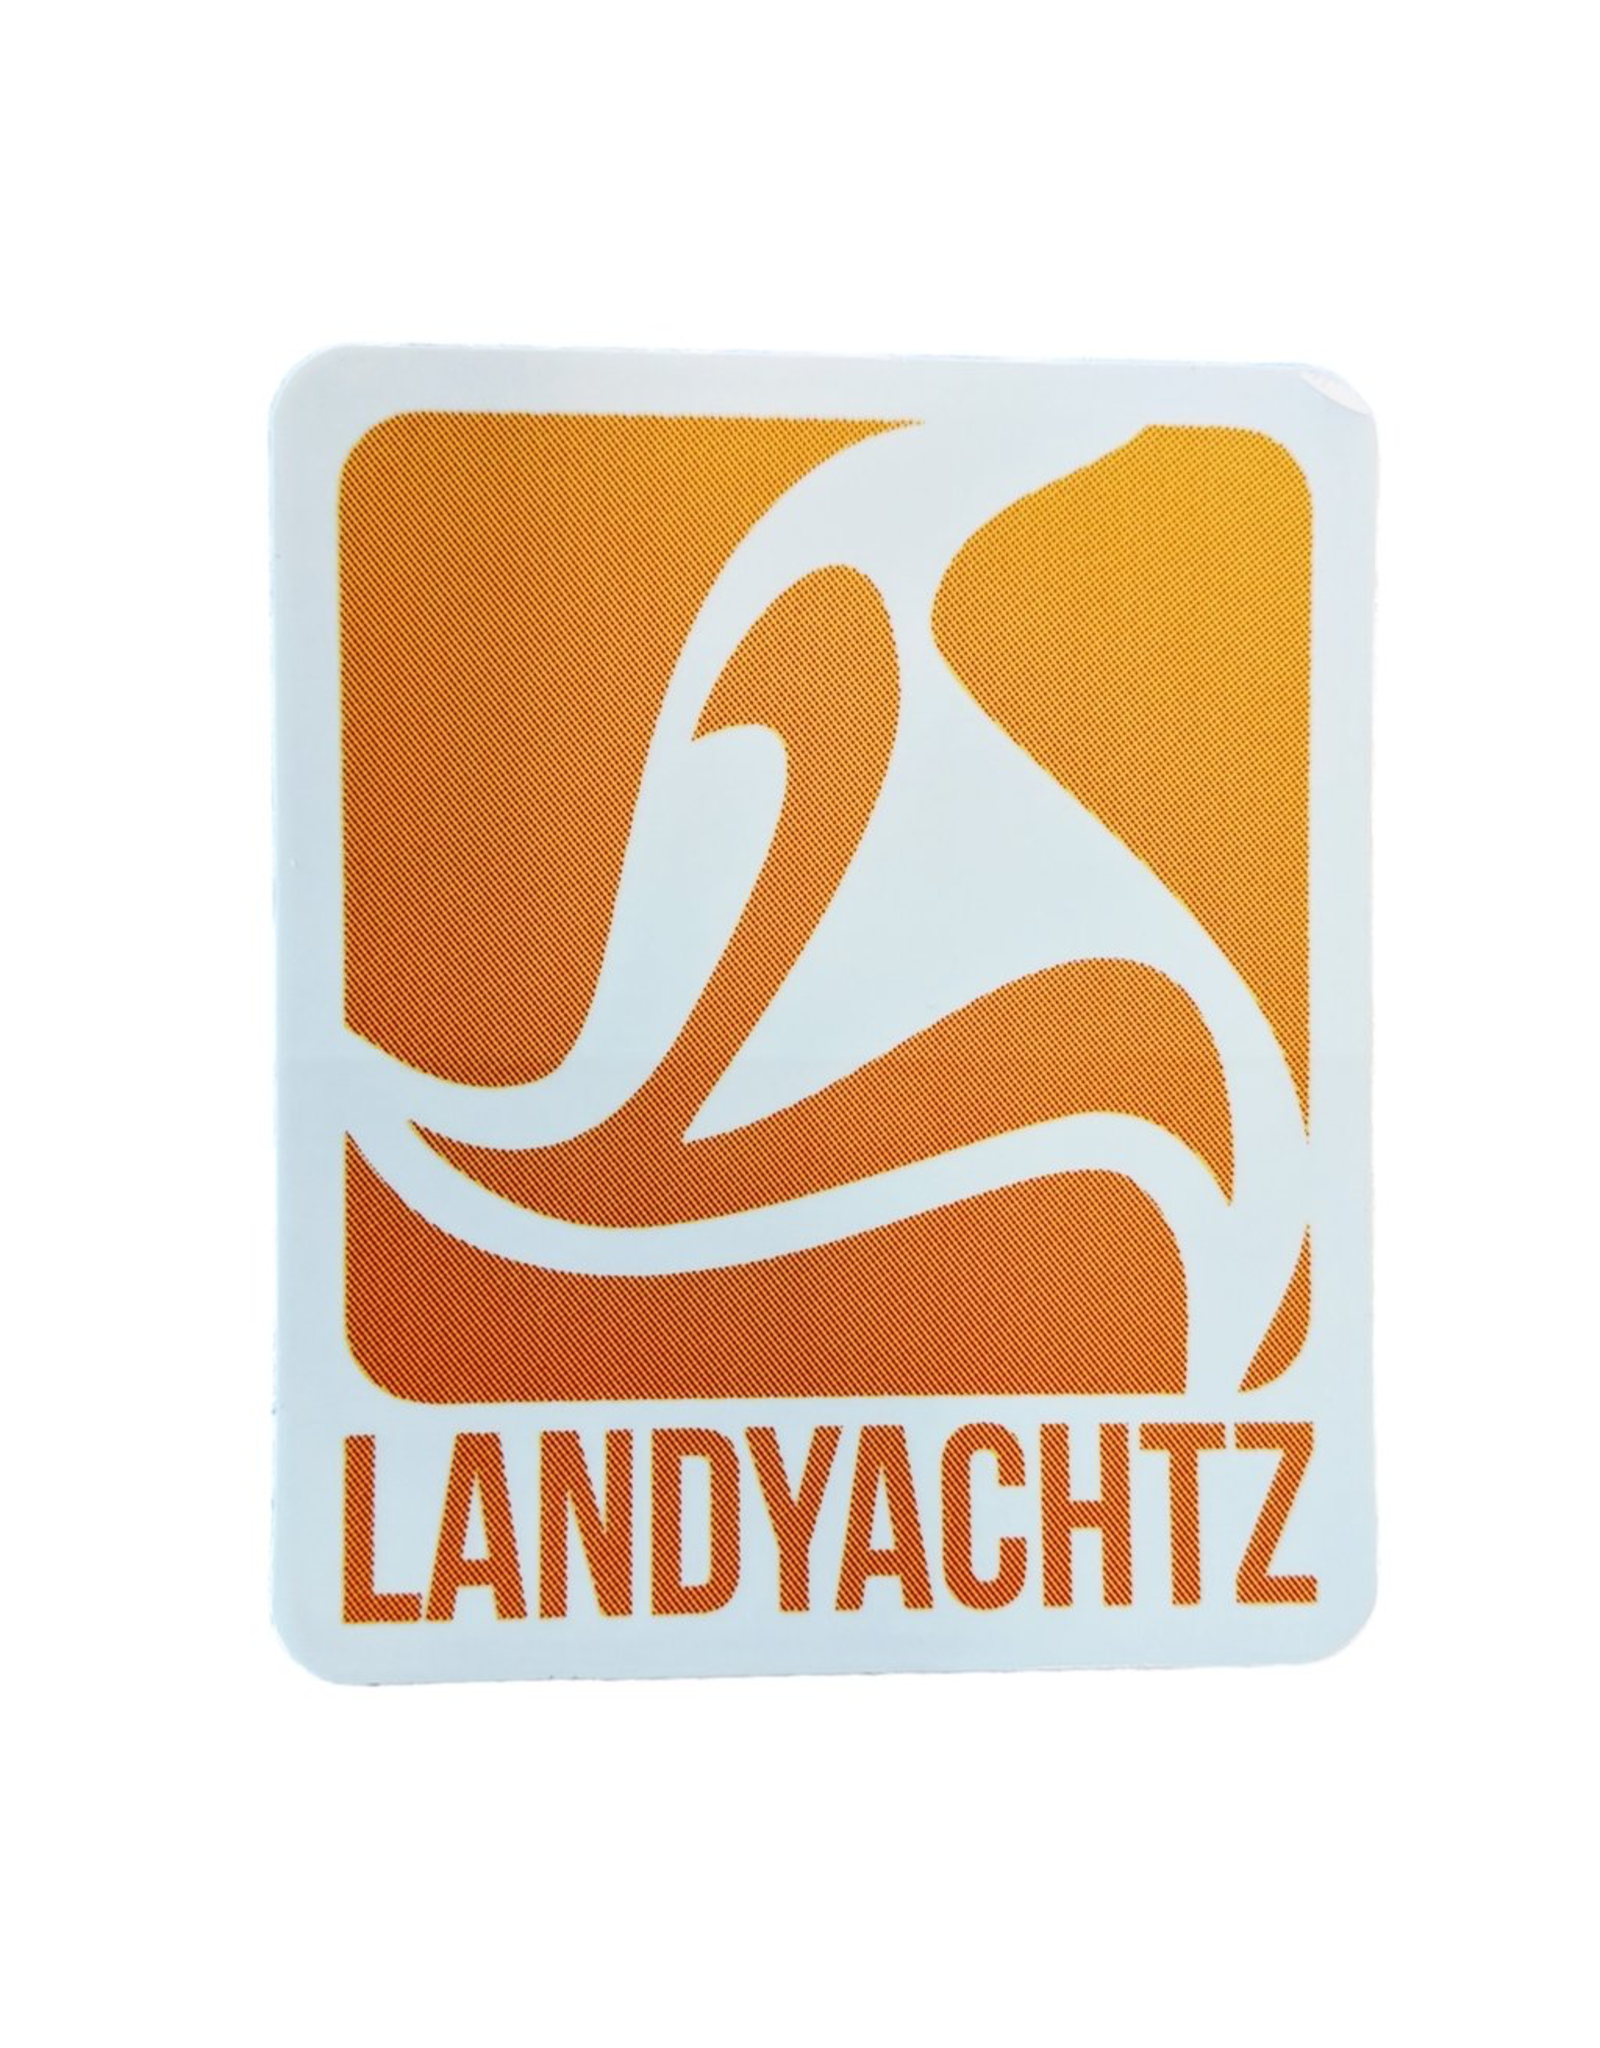 LANDYACHTZ ORANGE LOGO STICKER